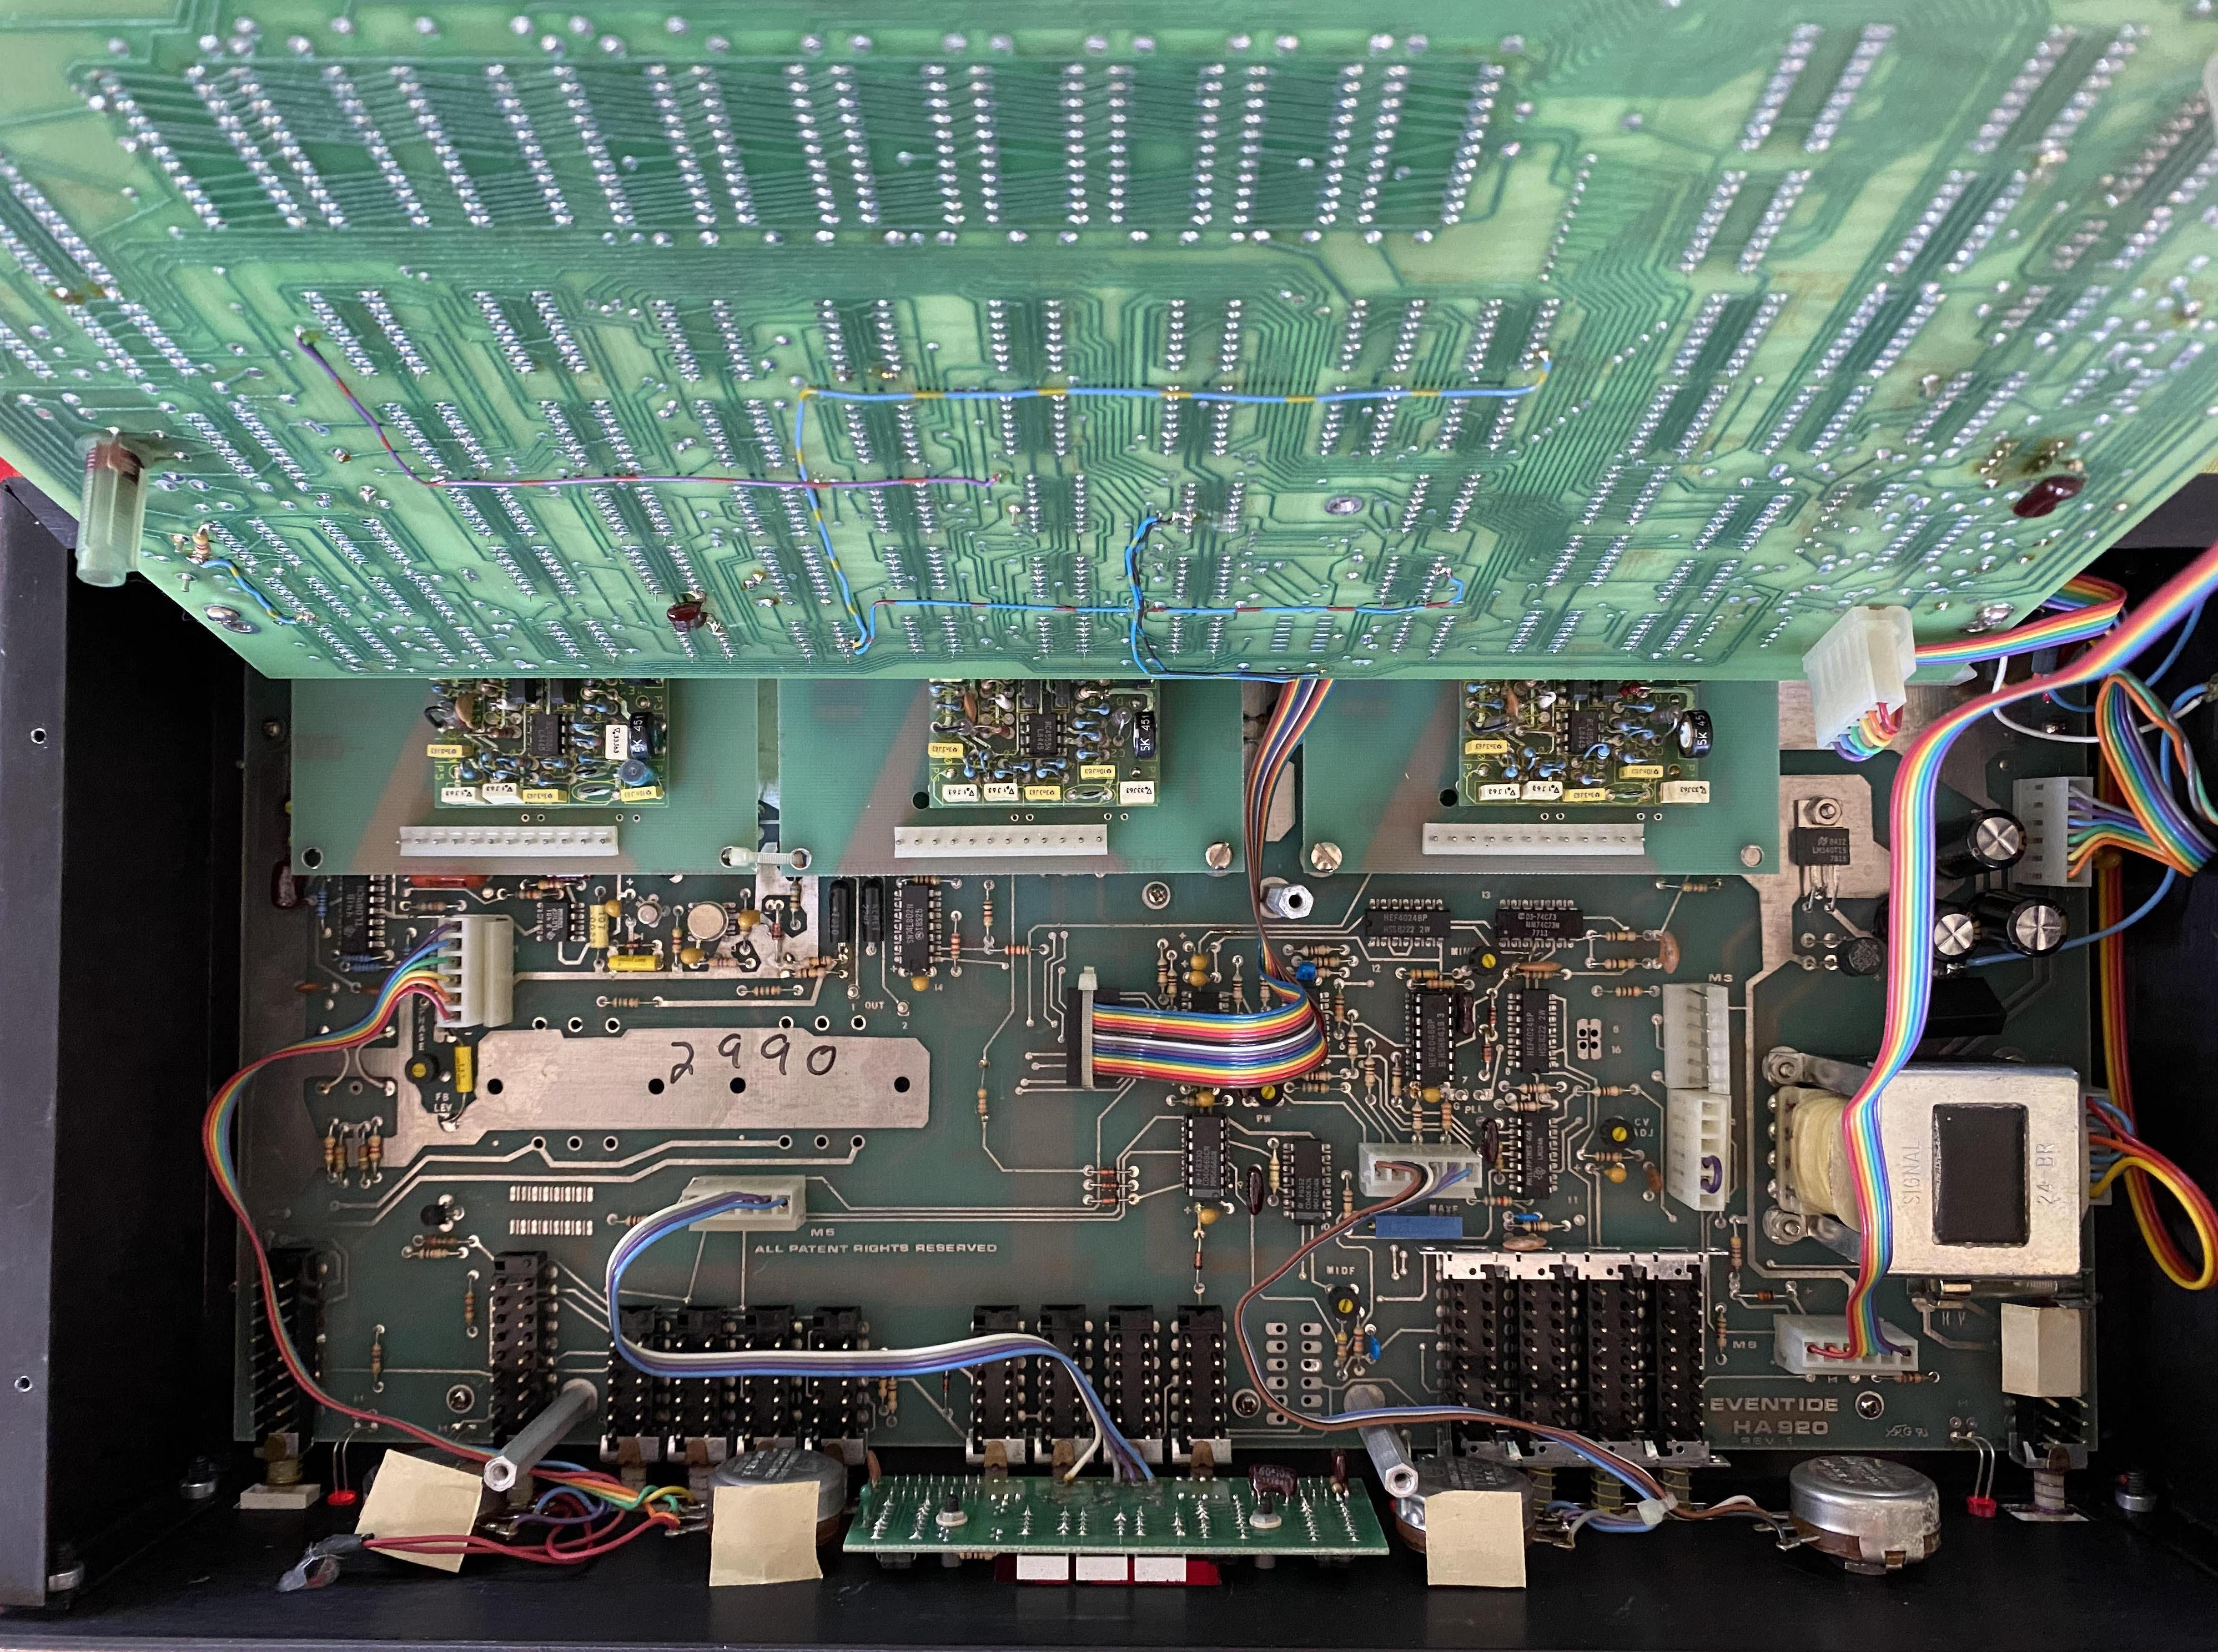 Inside the H910